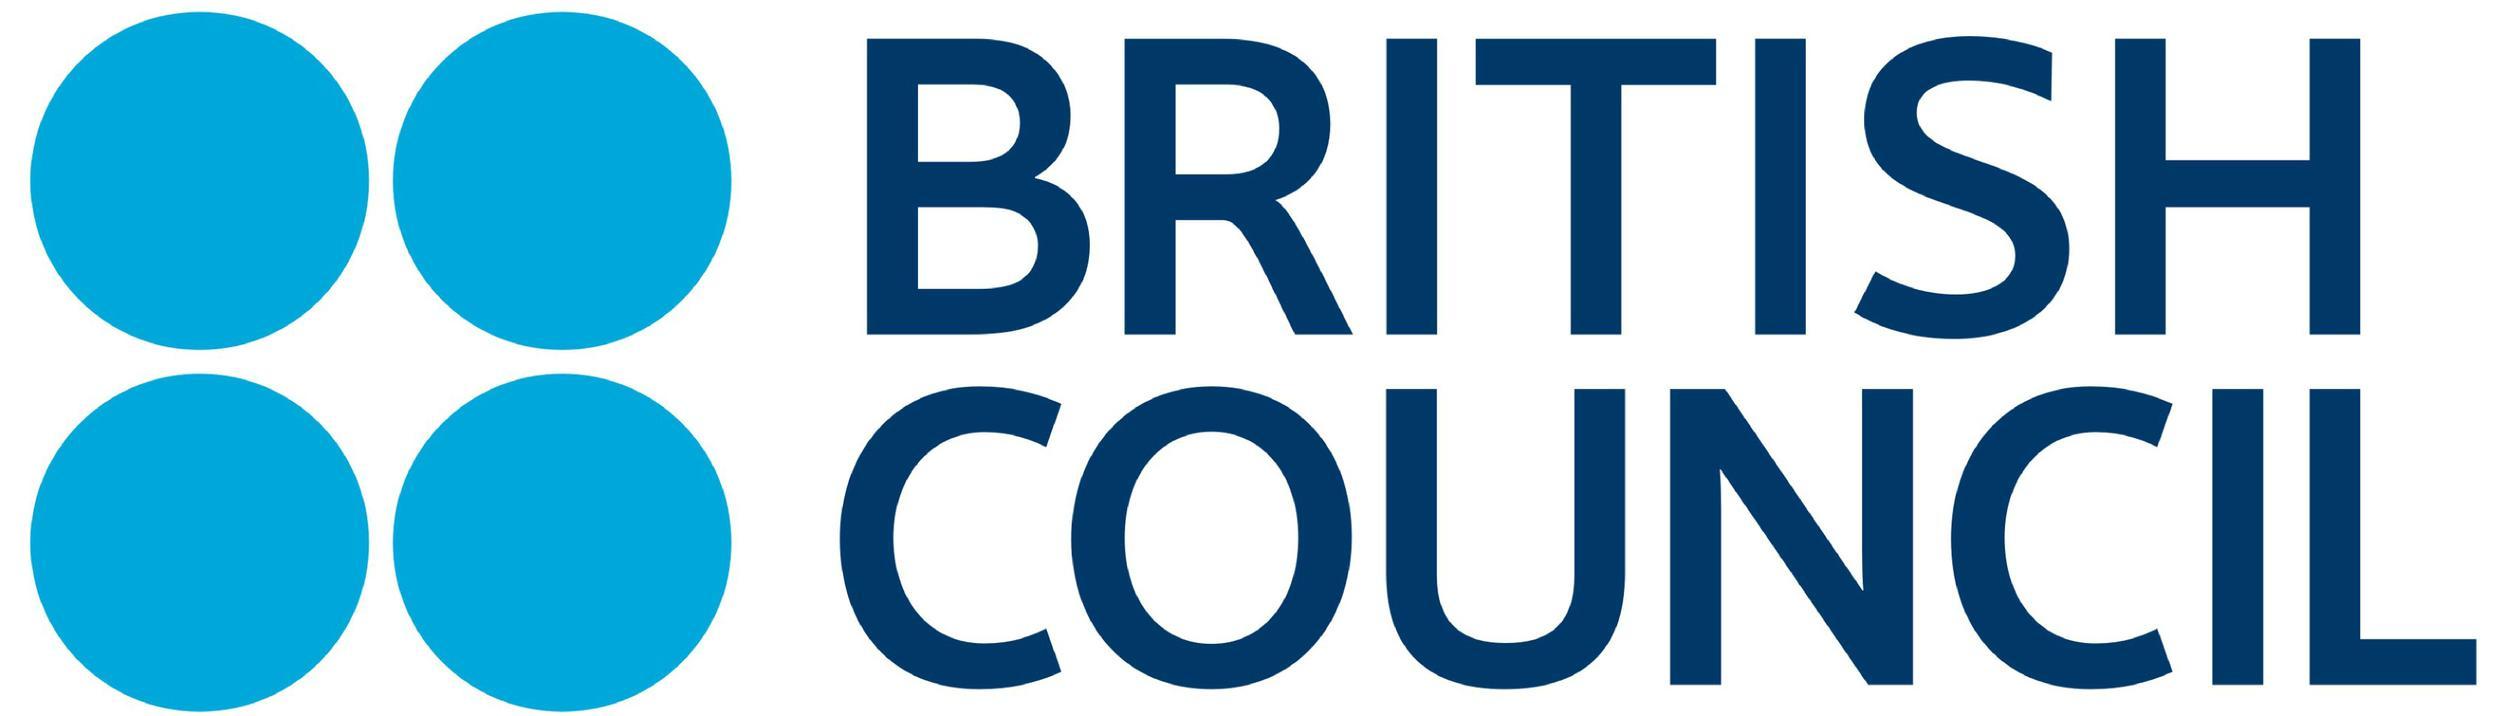 british_council.jpg